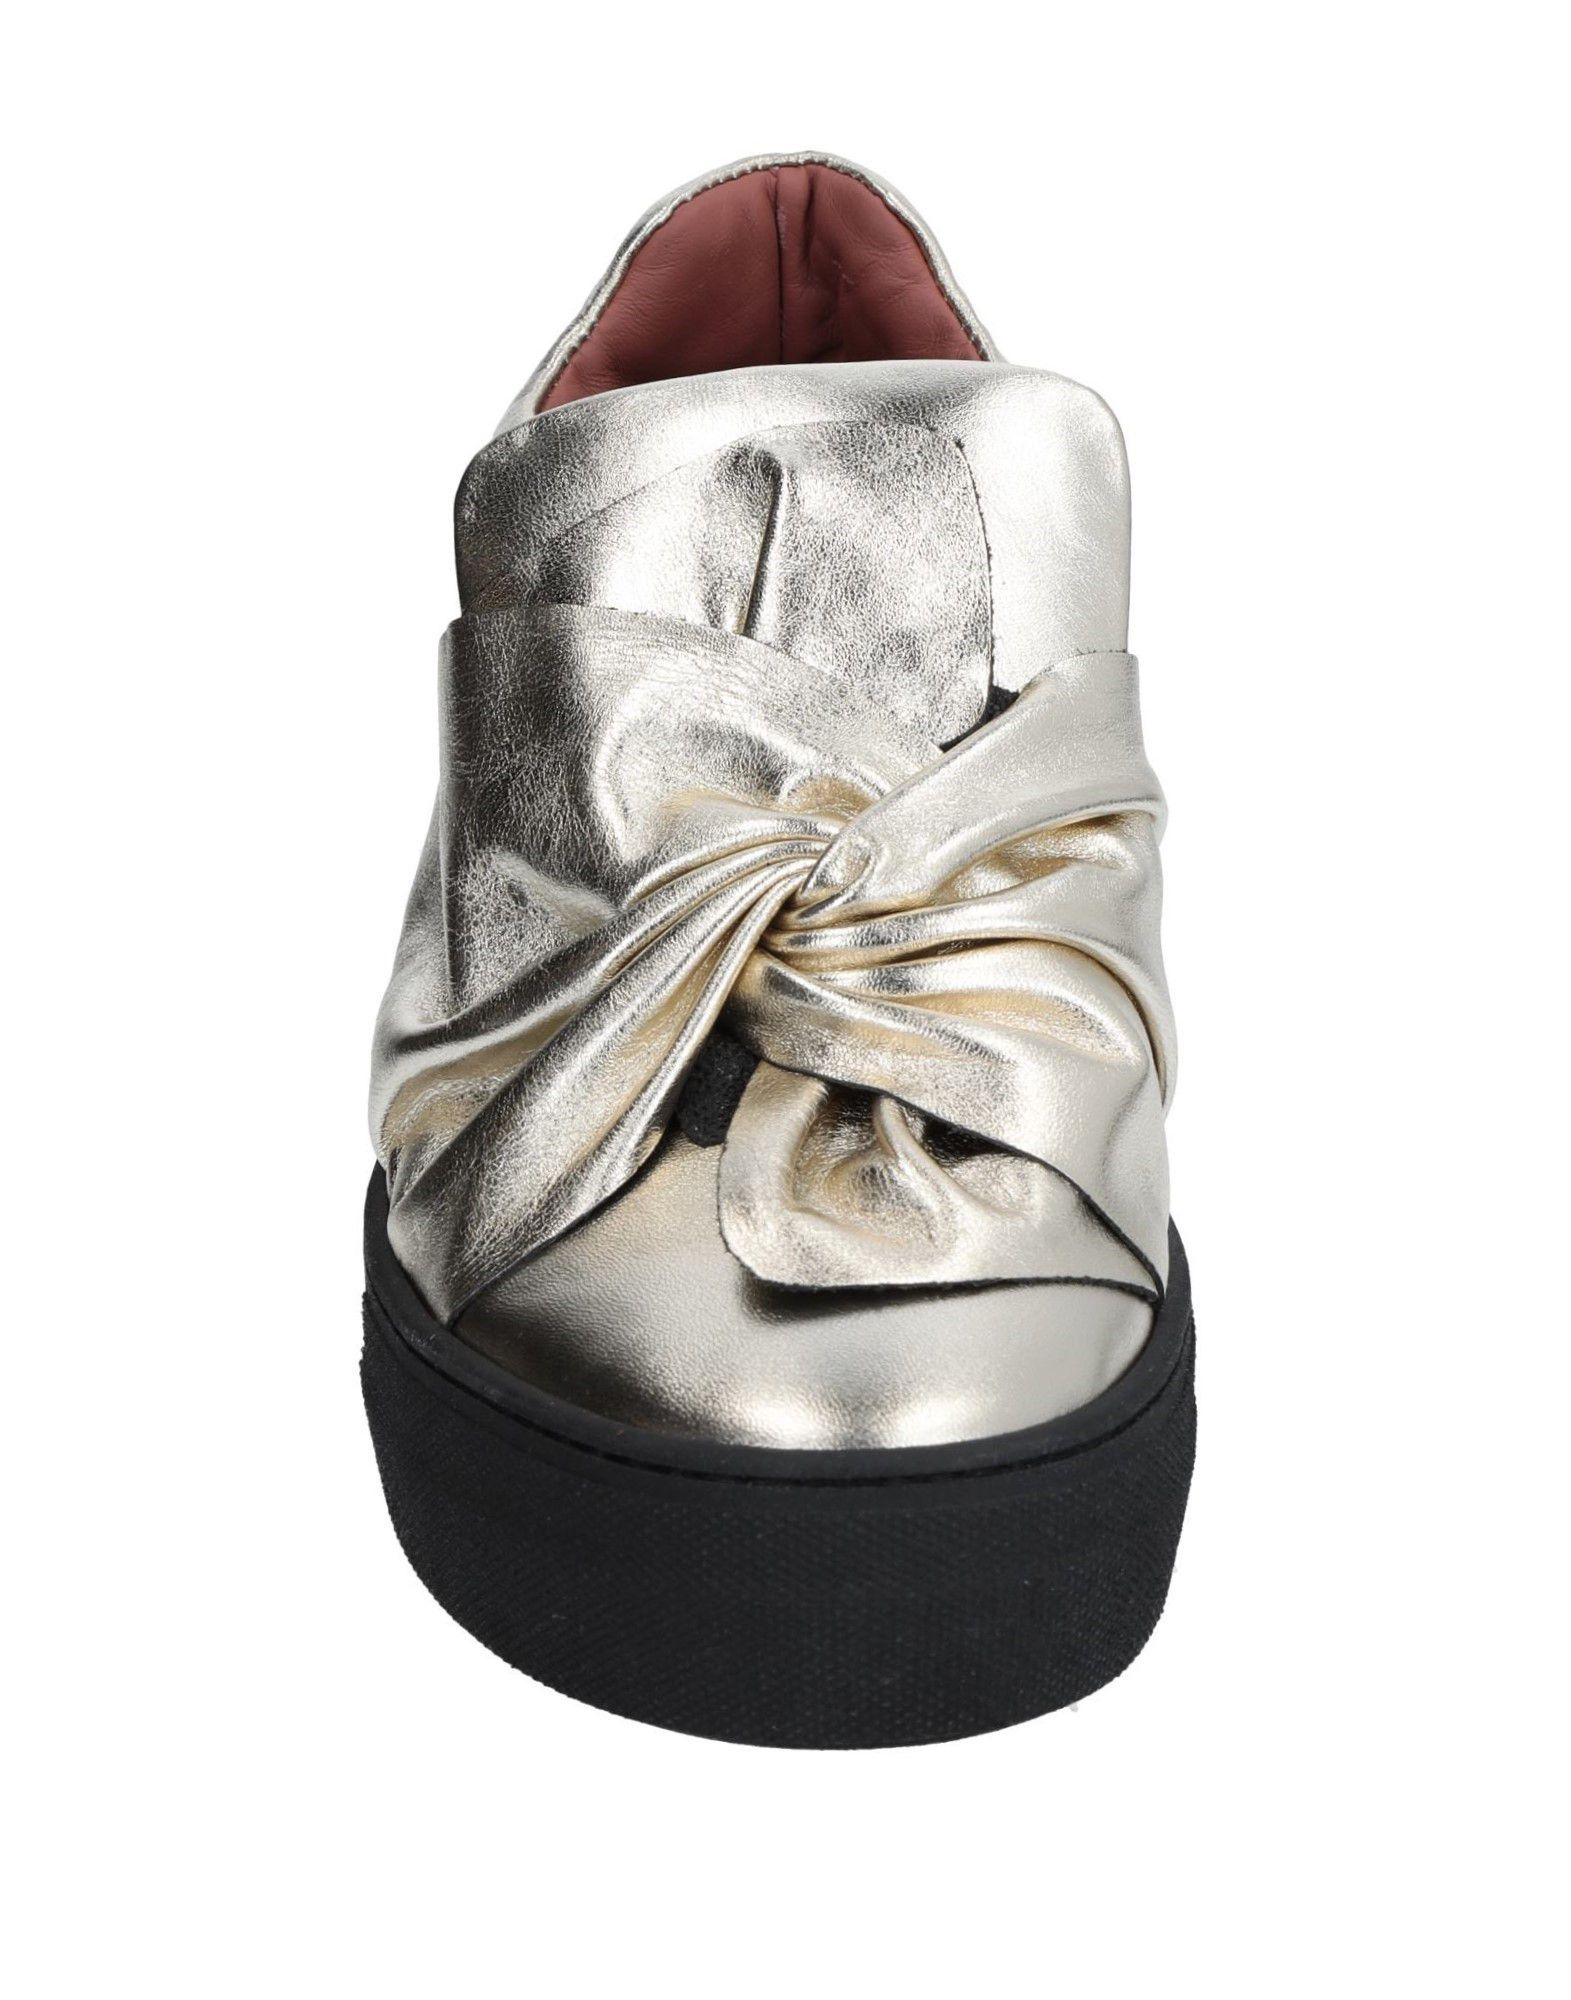 Andrea Morelli Sneakers Damen  11540604GE Qualität Gute Qualität 11540604GE beliebte Schuhe e170b9